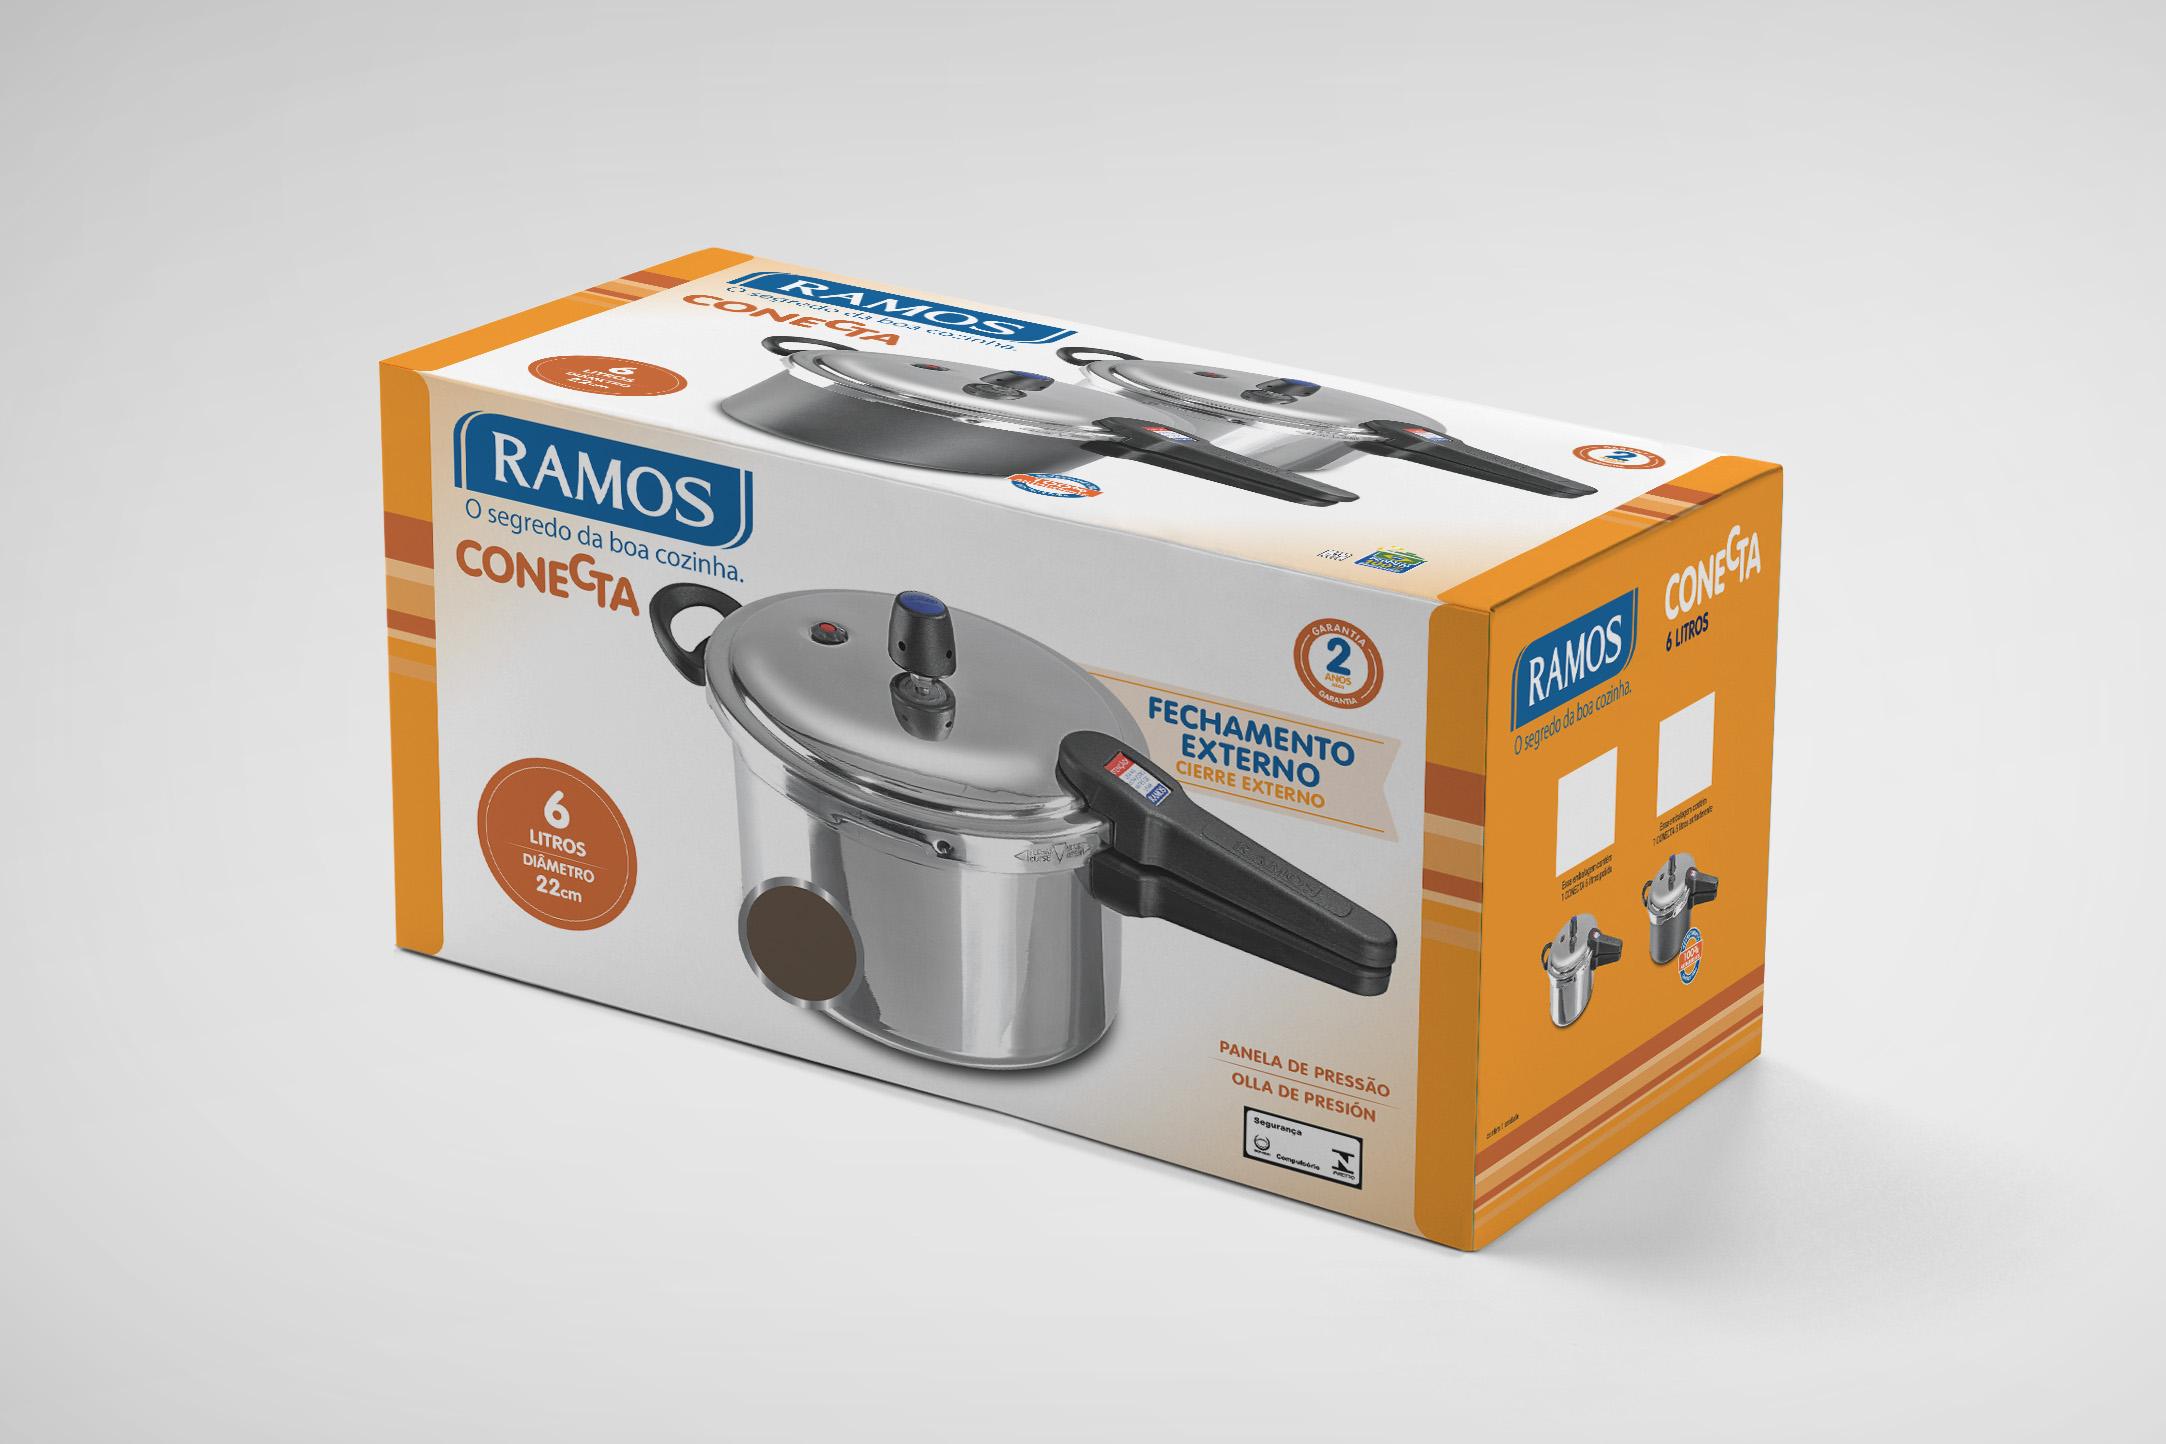 Aluminio Ramos - Embalagem Conecta